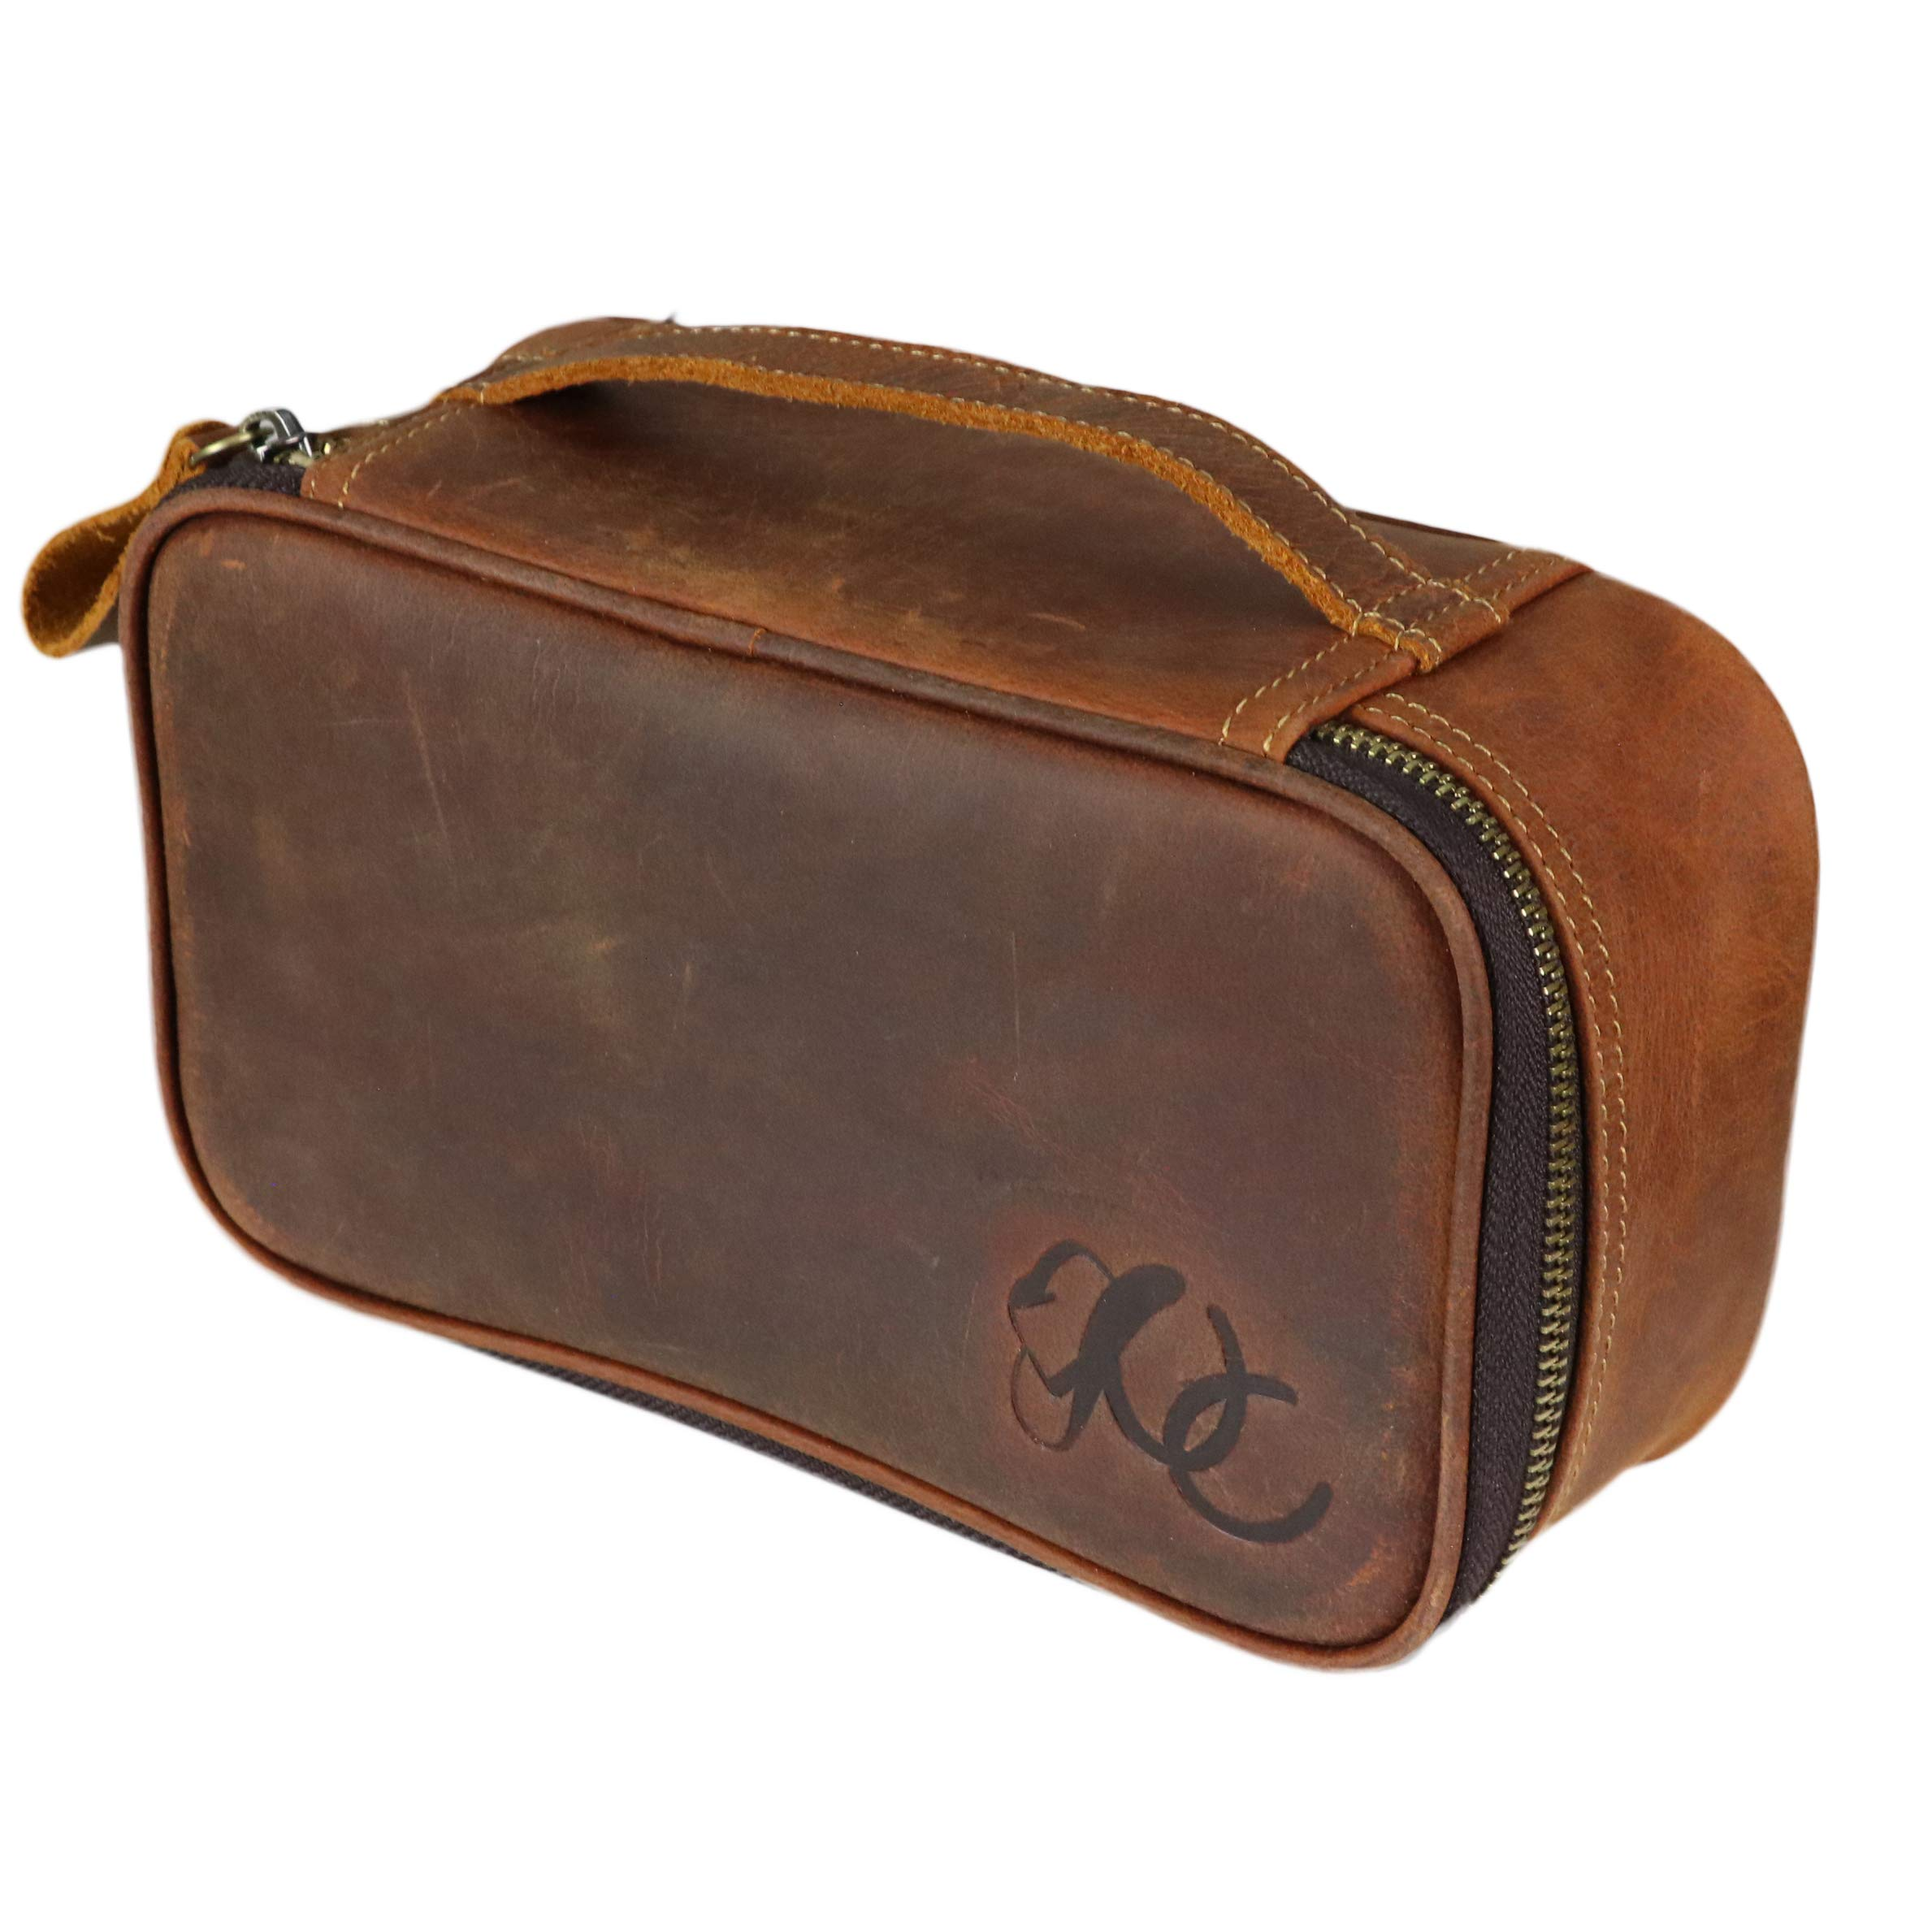 Western Toiletry Bag (Dopp Kit) For Men by Urban Cowboy - Genuine Leather